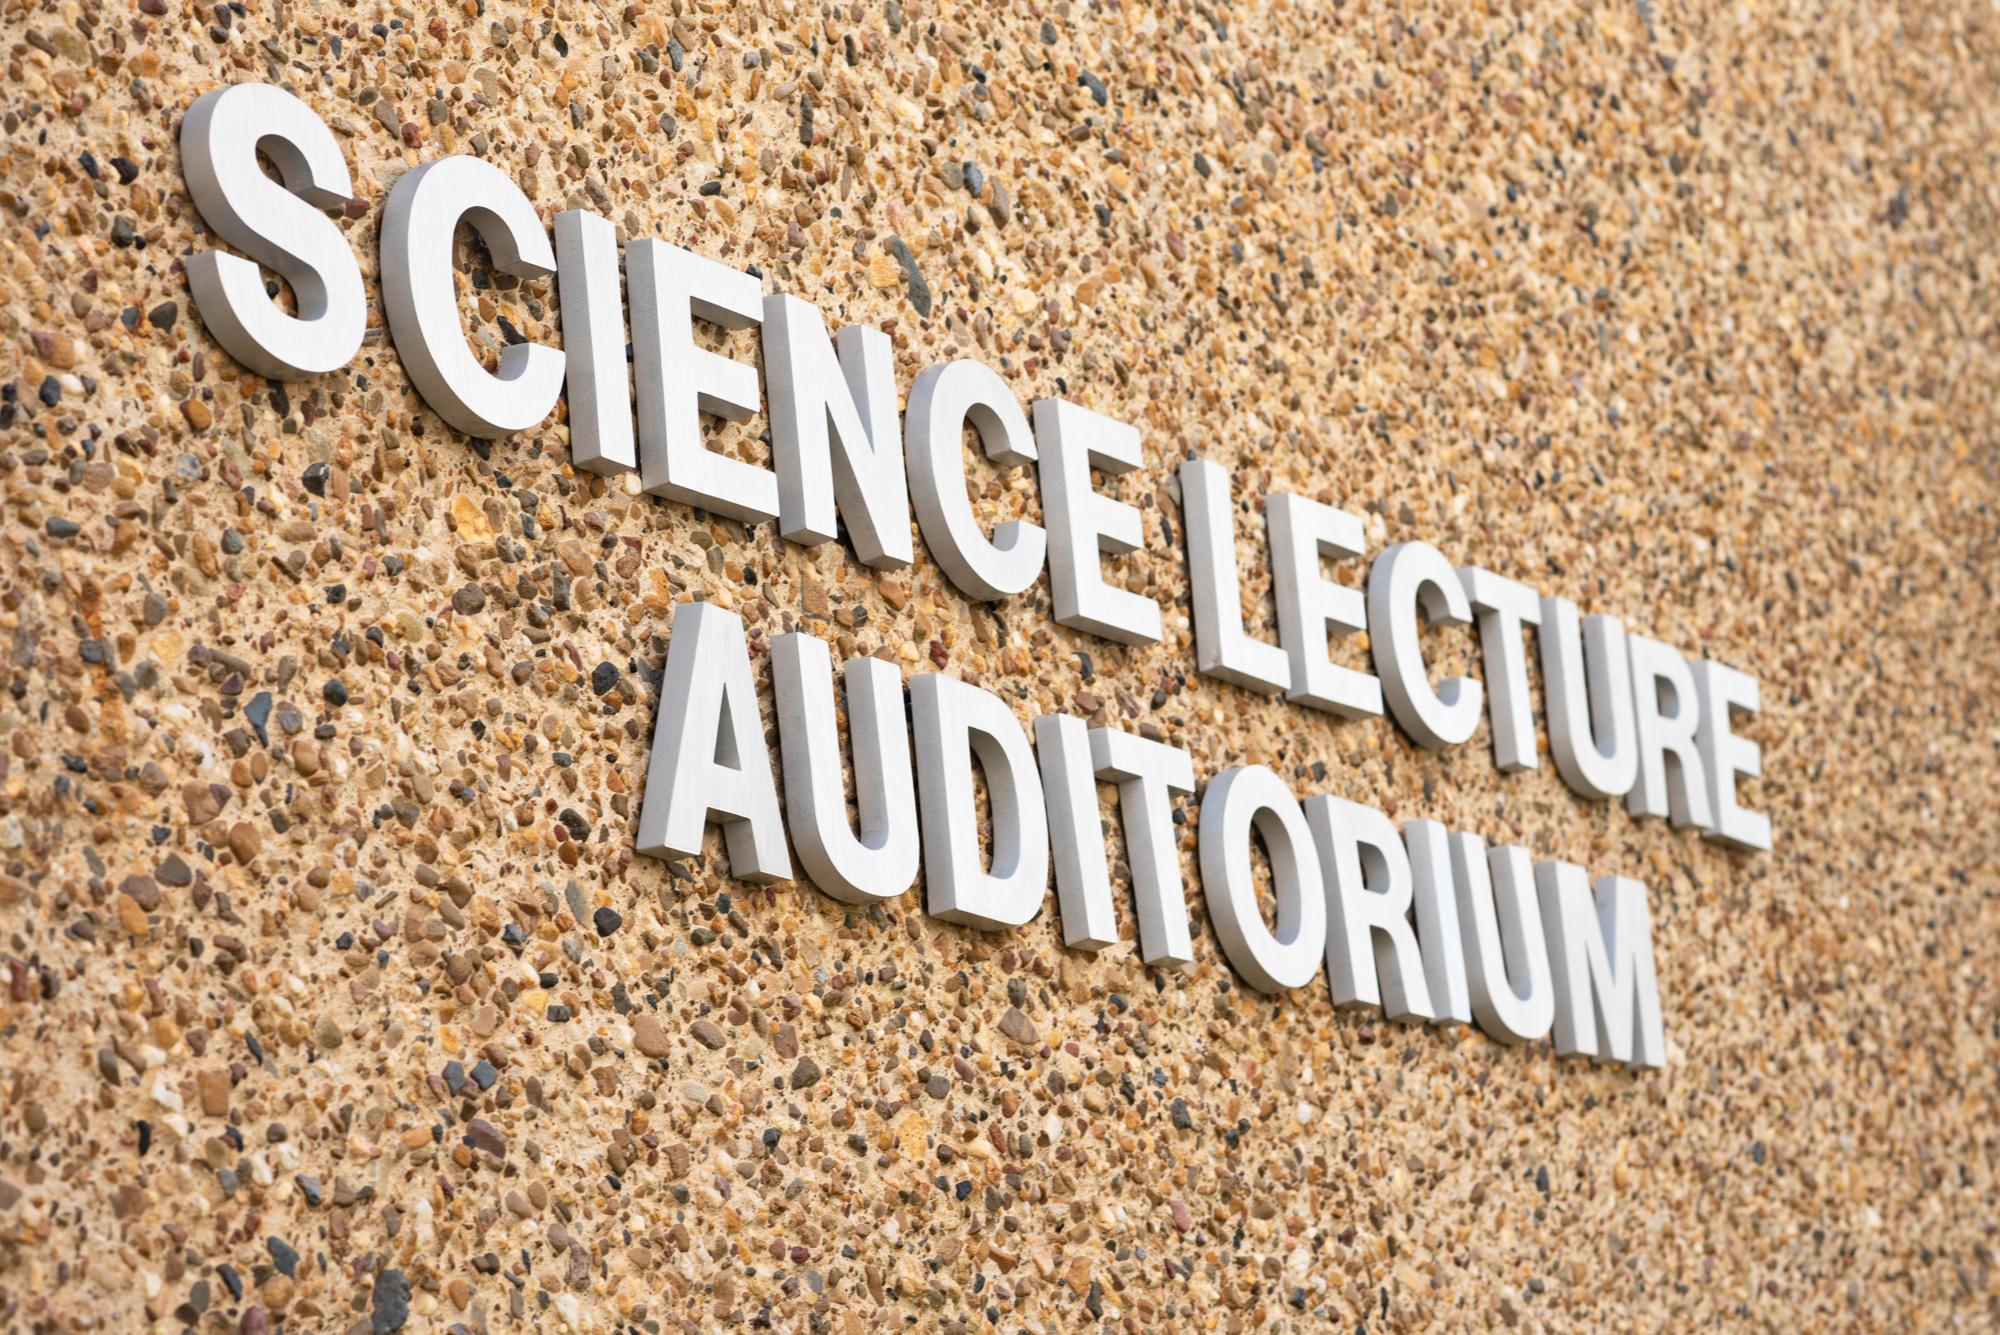 Ethos lettering at LSUS